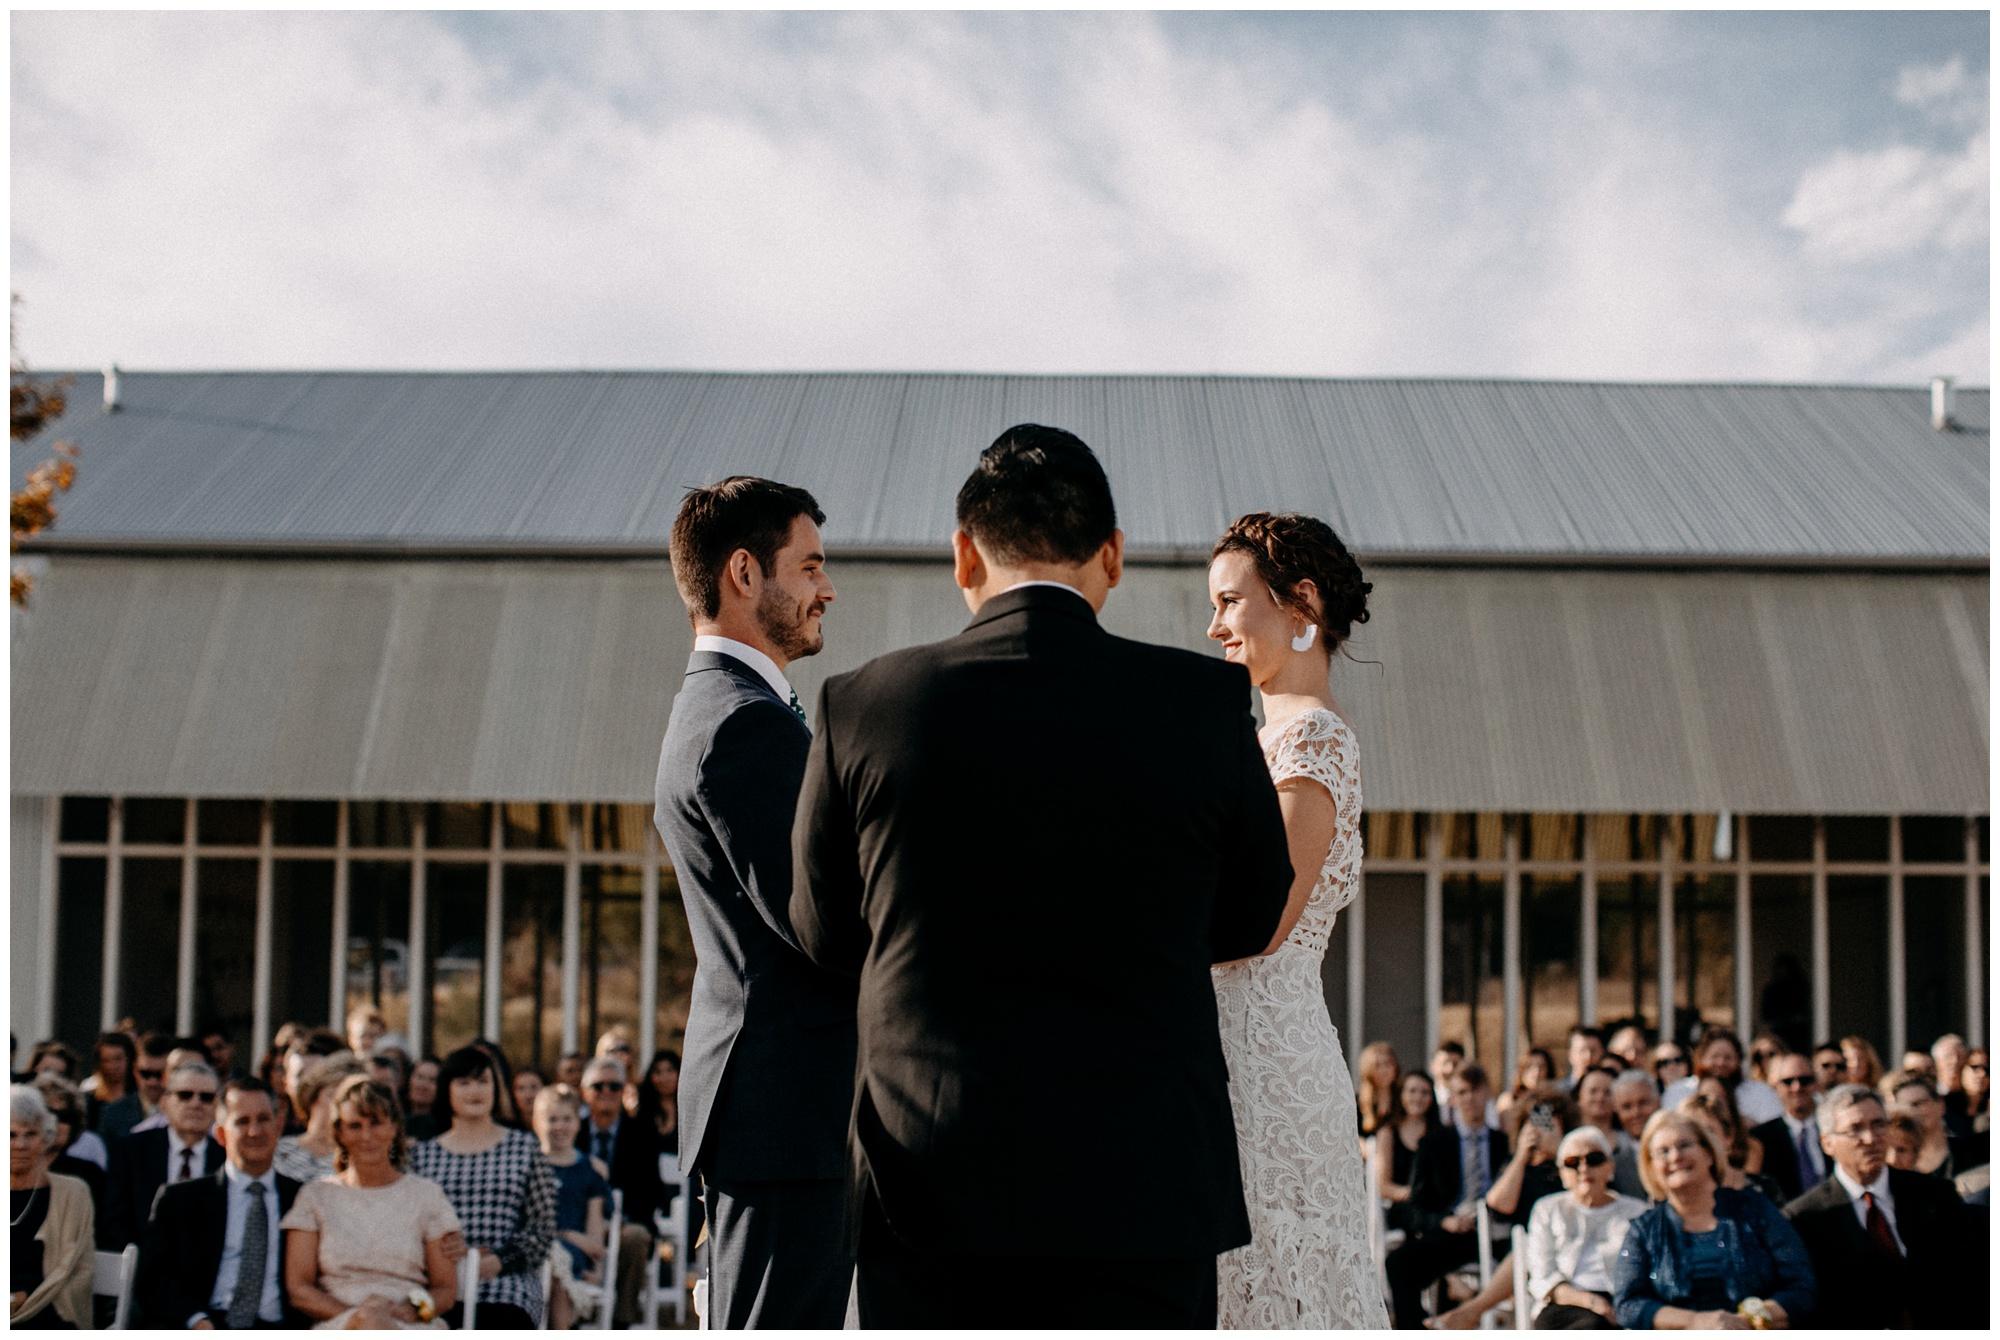 AUSTIN-TEXAS-PROSPECT-HOUSE-WEDDING-VENUE-PHOTOGRAPHY25792.JPG